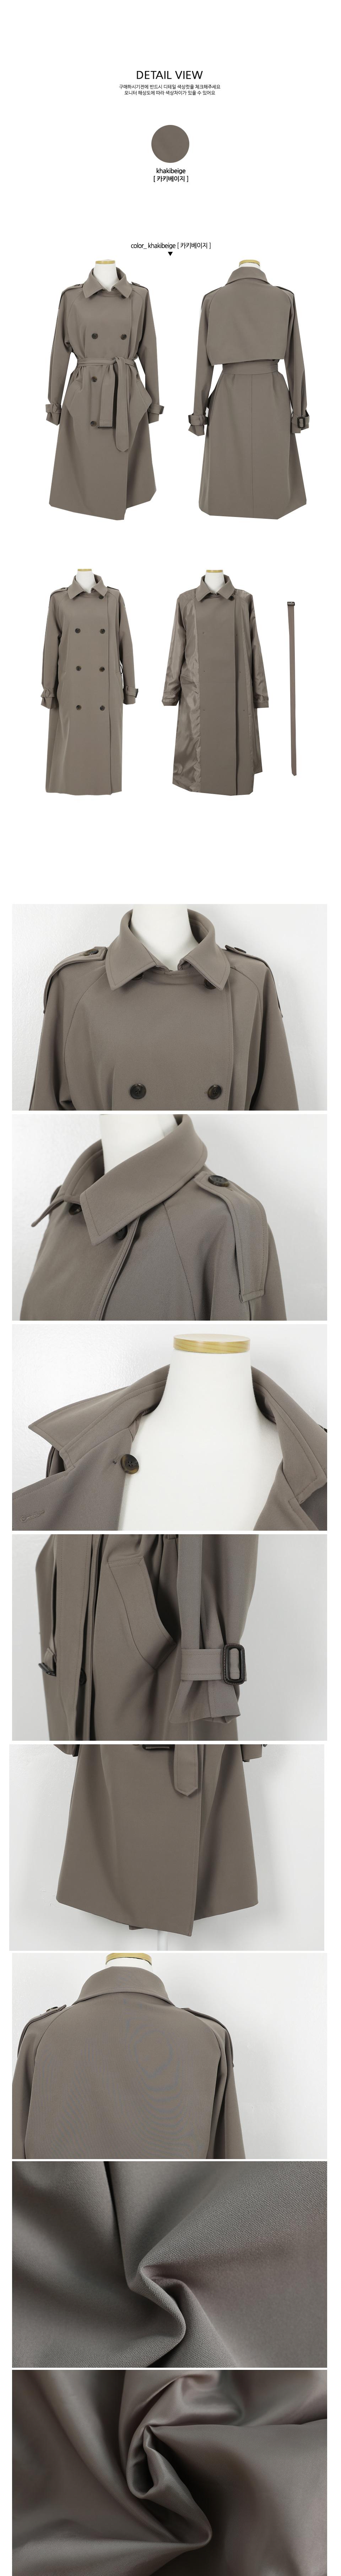 Dart classic trench coat